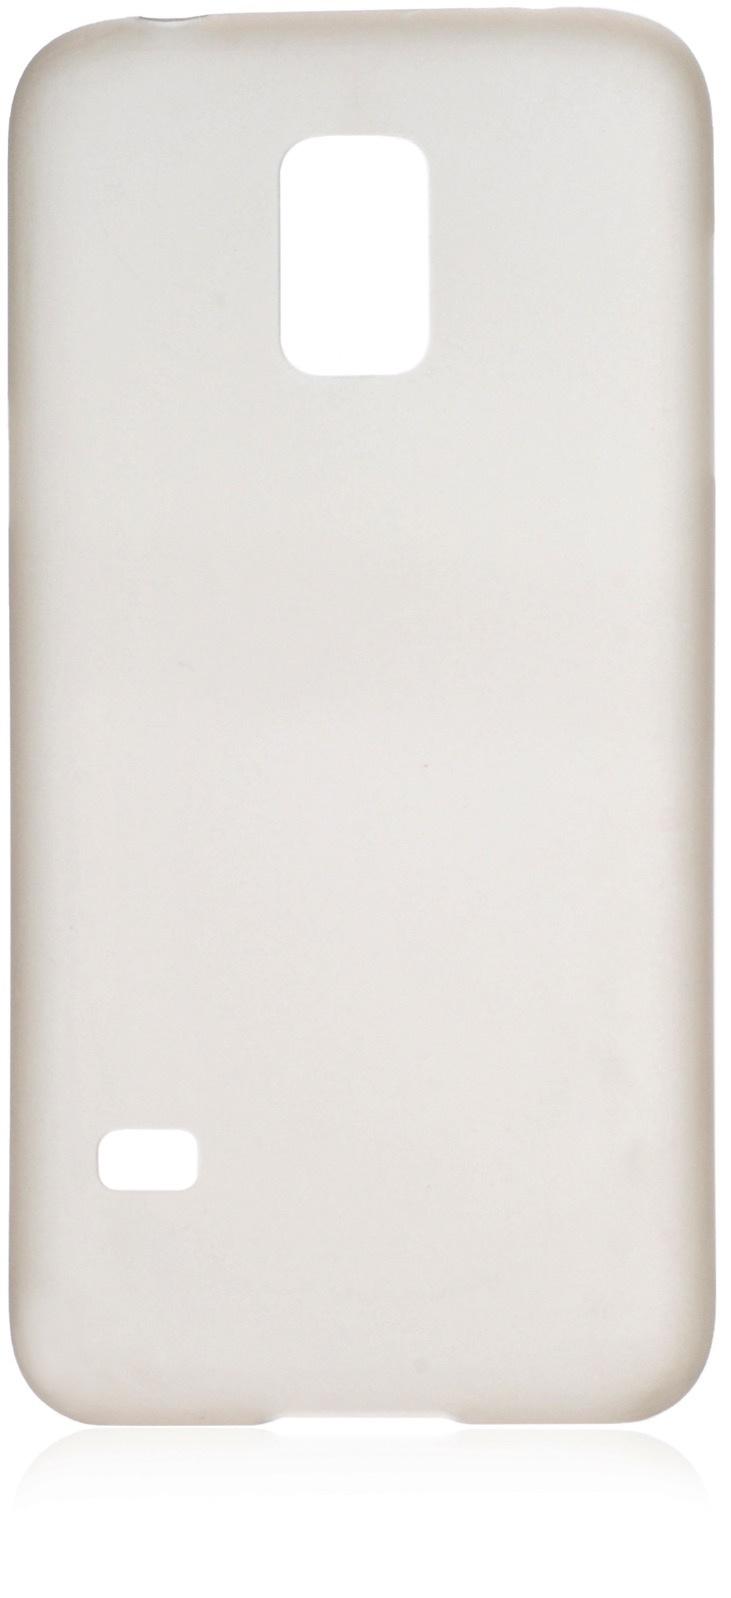 Чехол накладка iNeez пластик 0.3 мм 570008 для Samsung Galaxy S5 mini,570008, серый